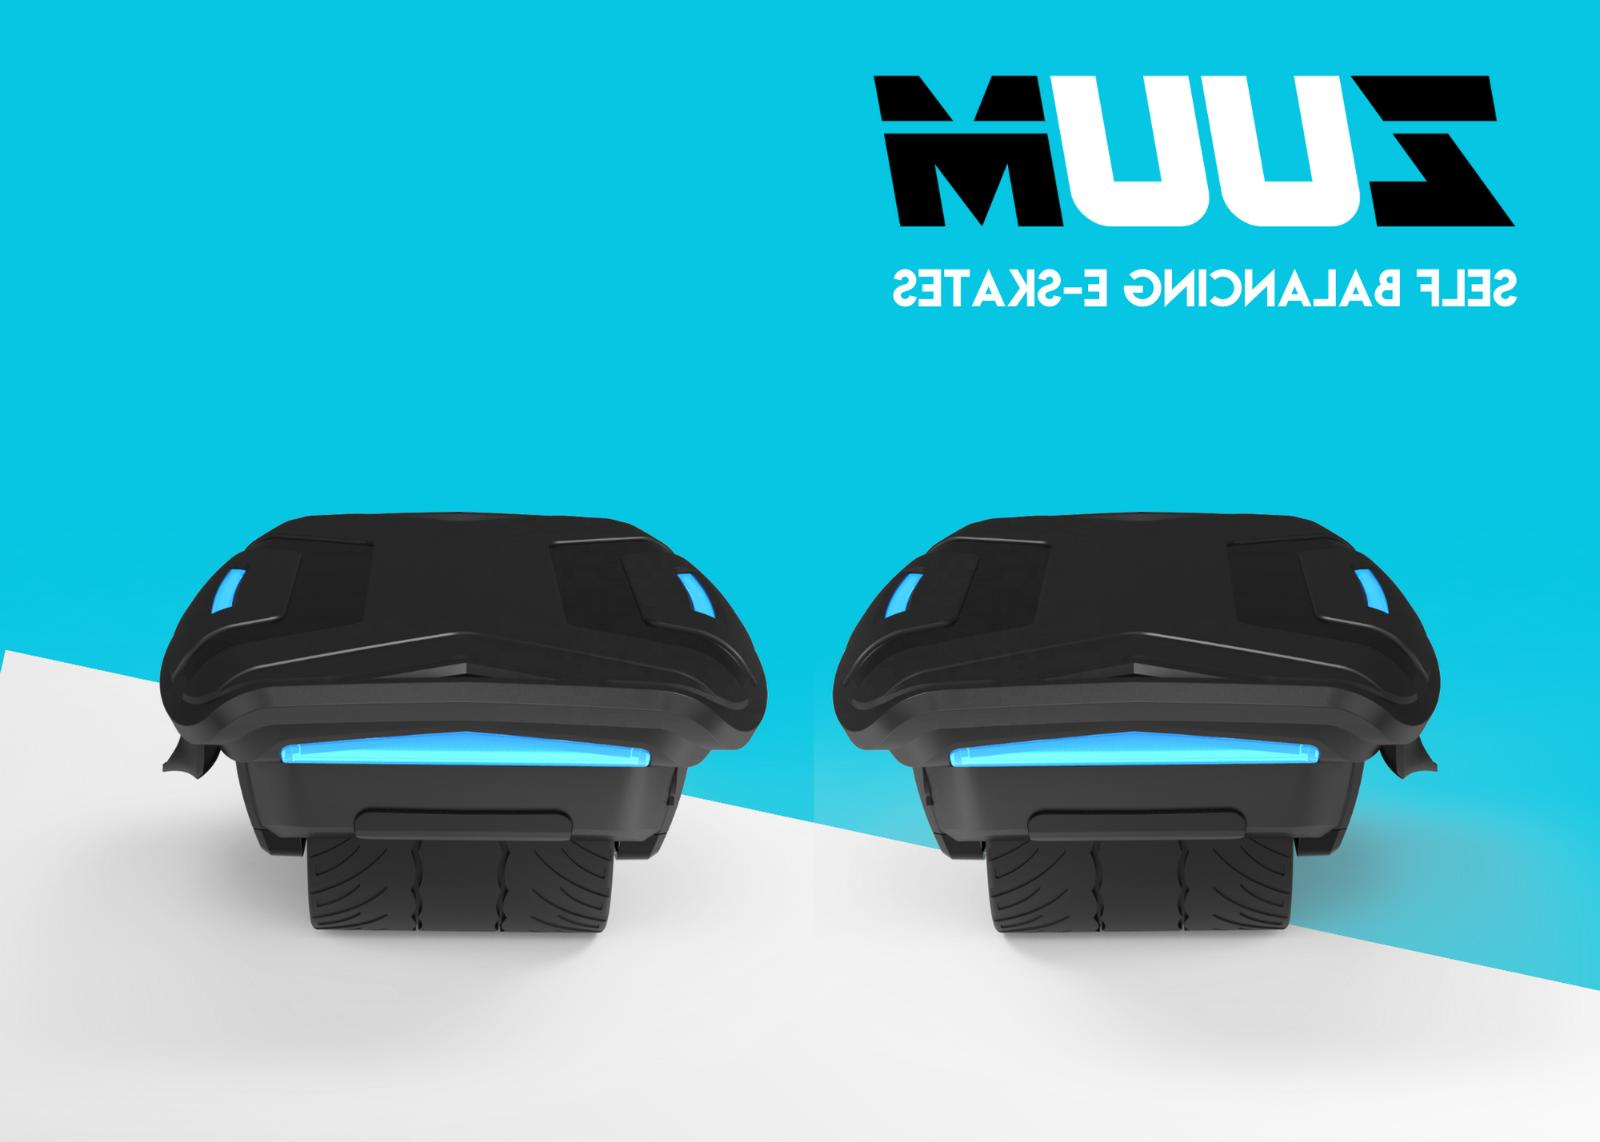 ZUUM Shoes | Seen on | Portable Balancing Skates